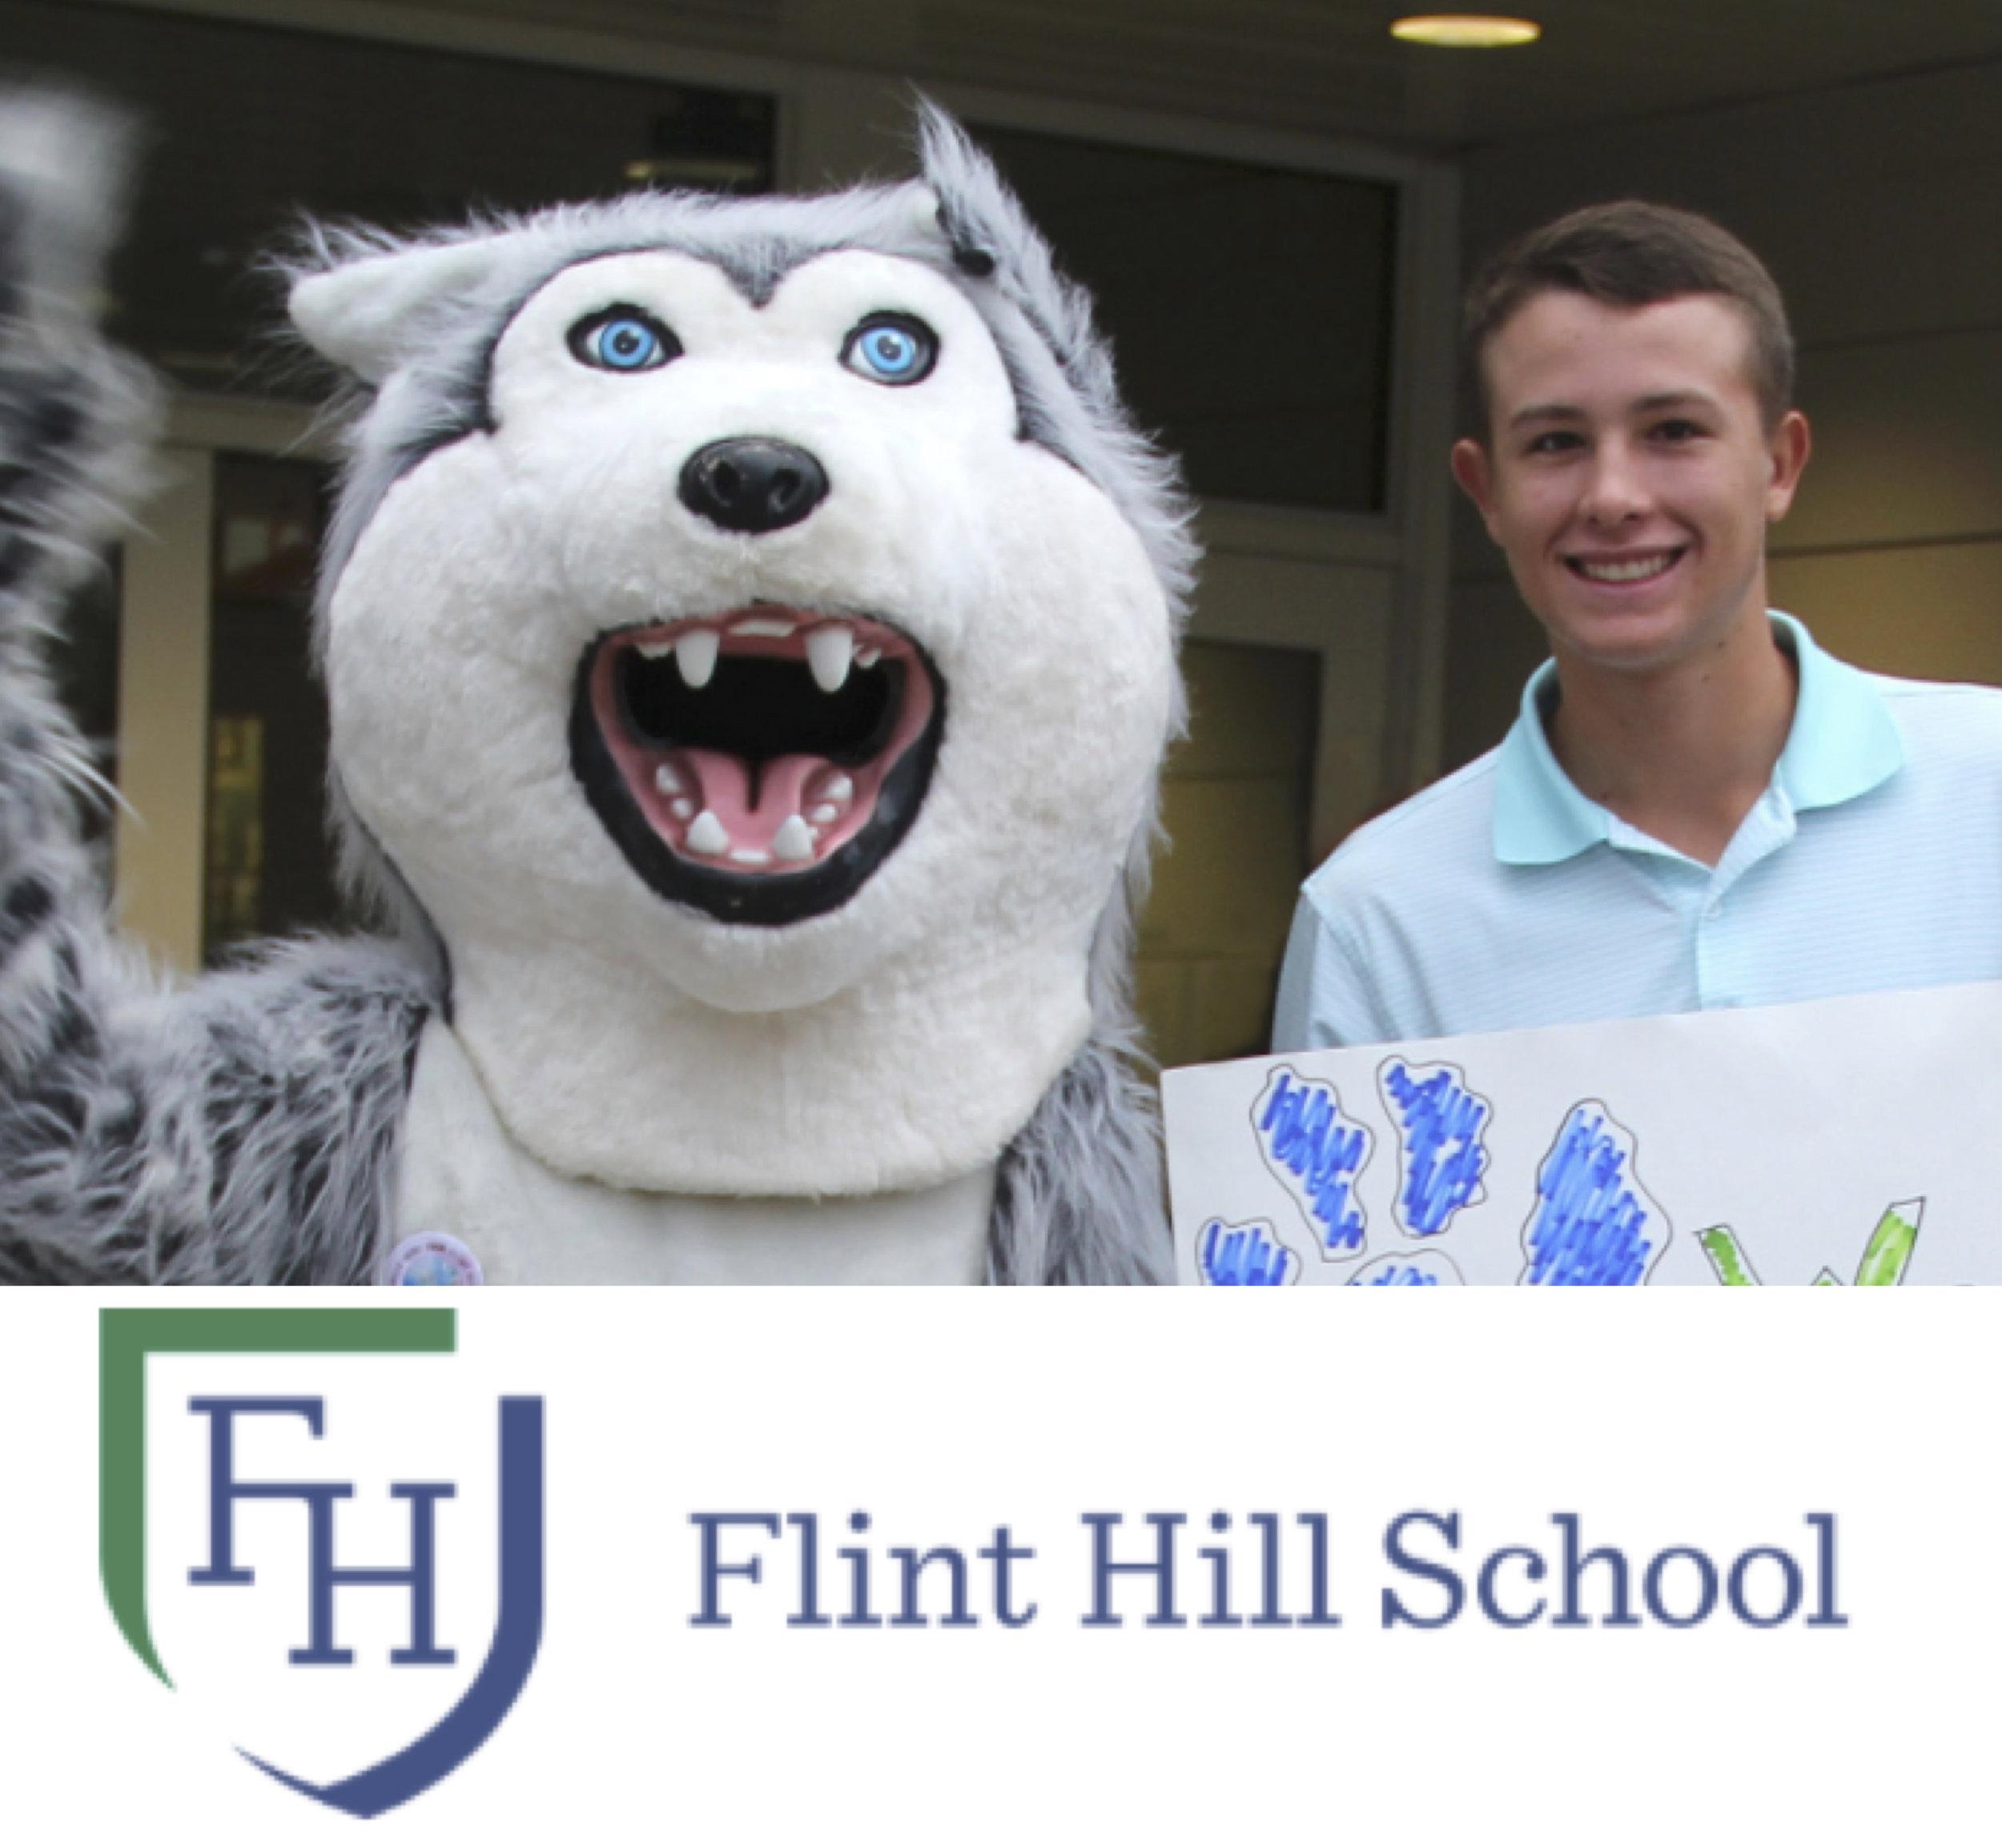 FLINT HILL SCHOOL